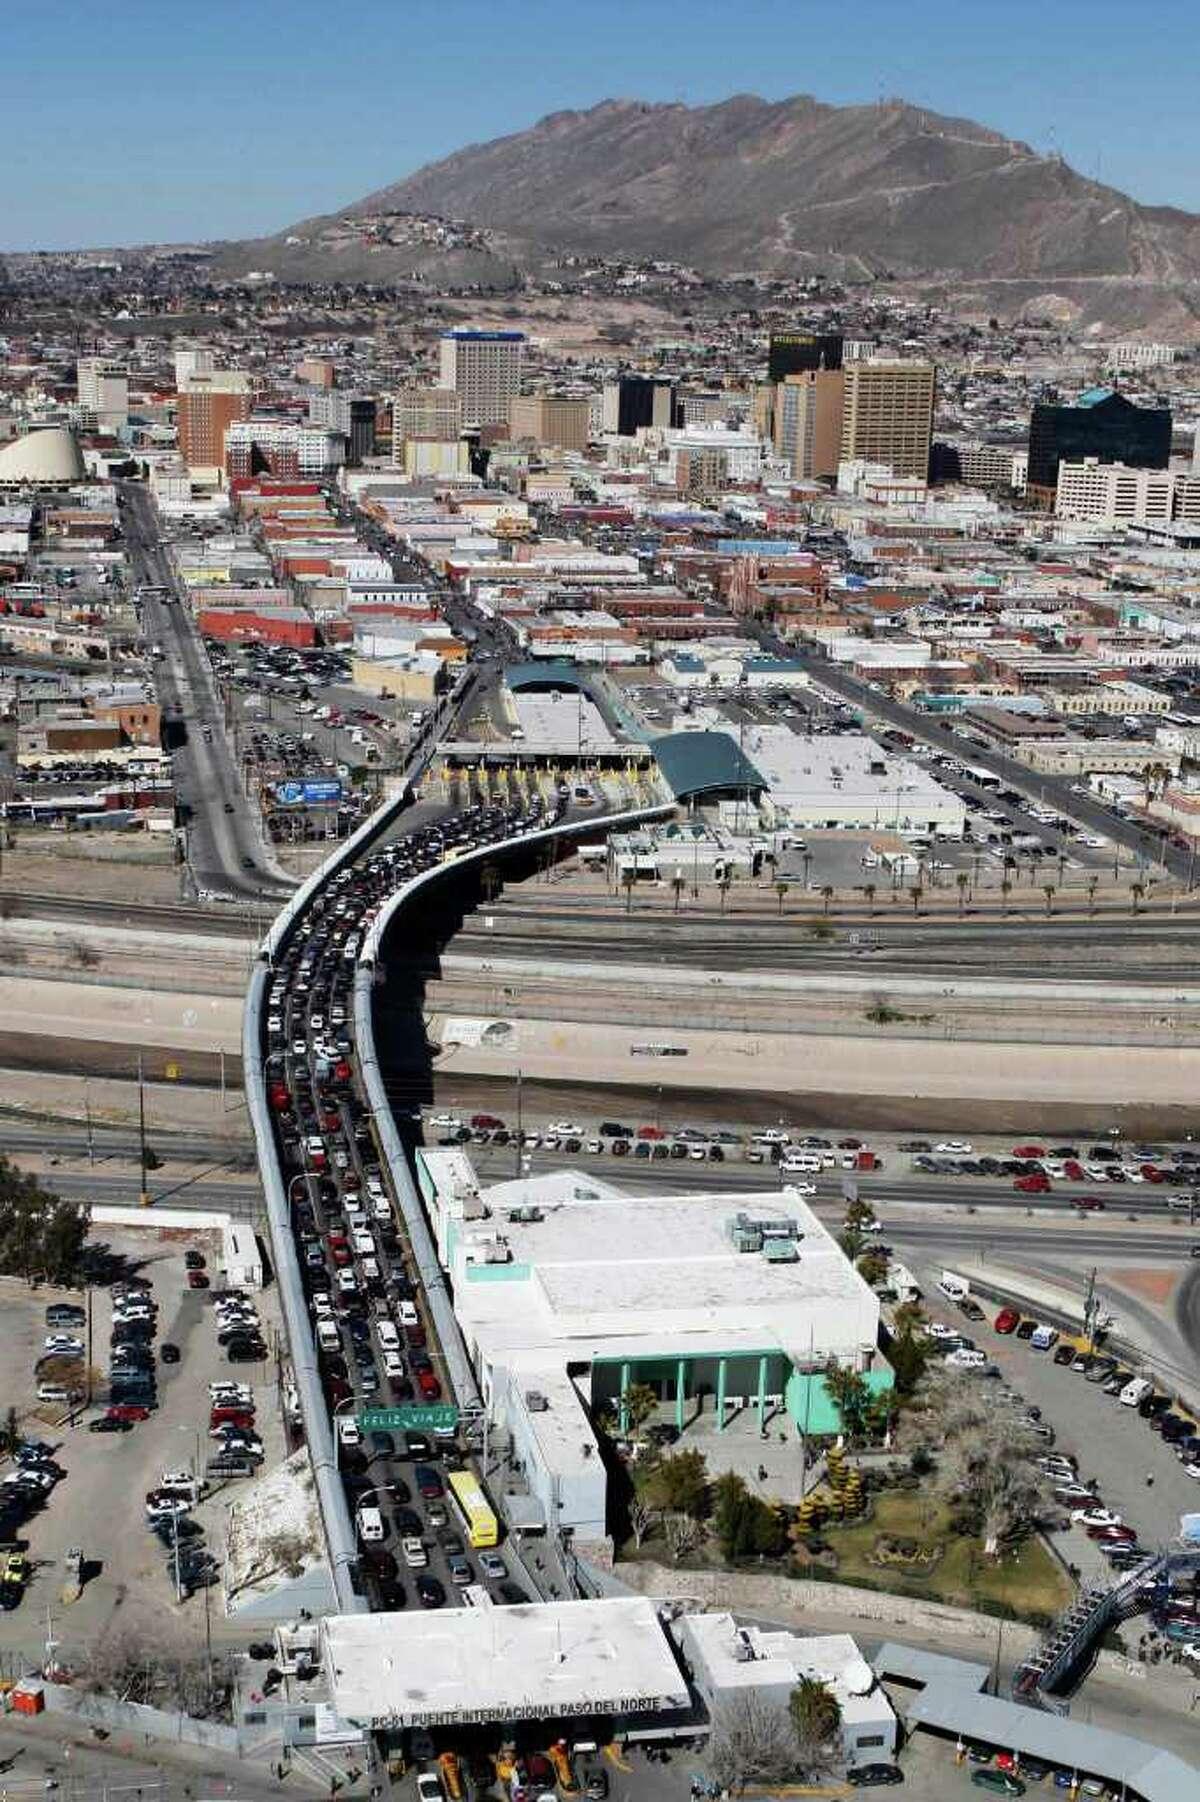 America's Least-Funniest Cities10. El Paso